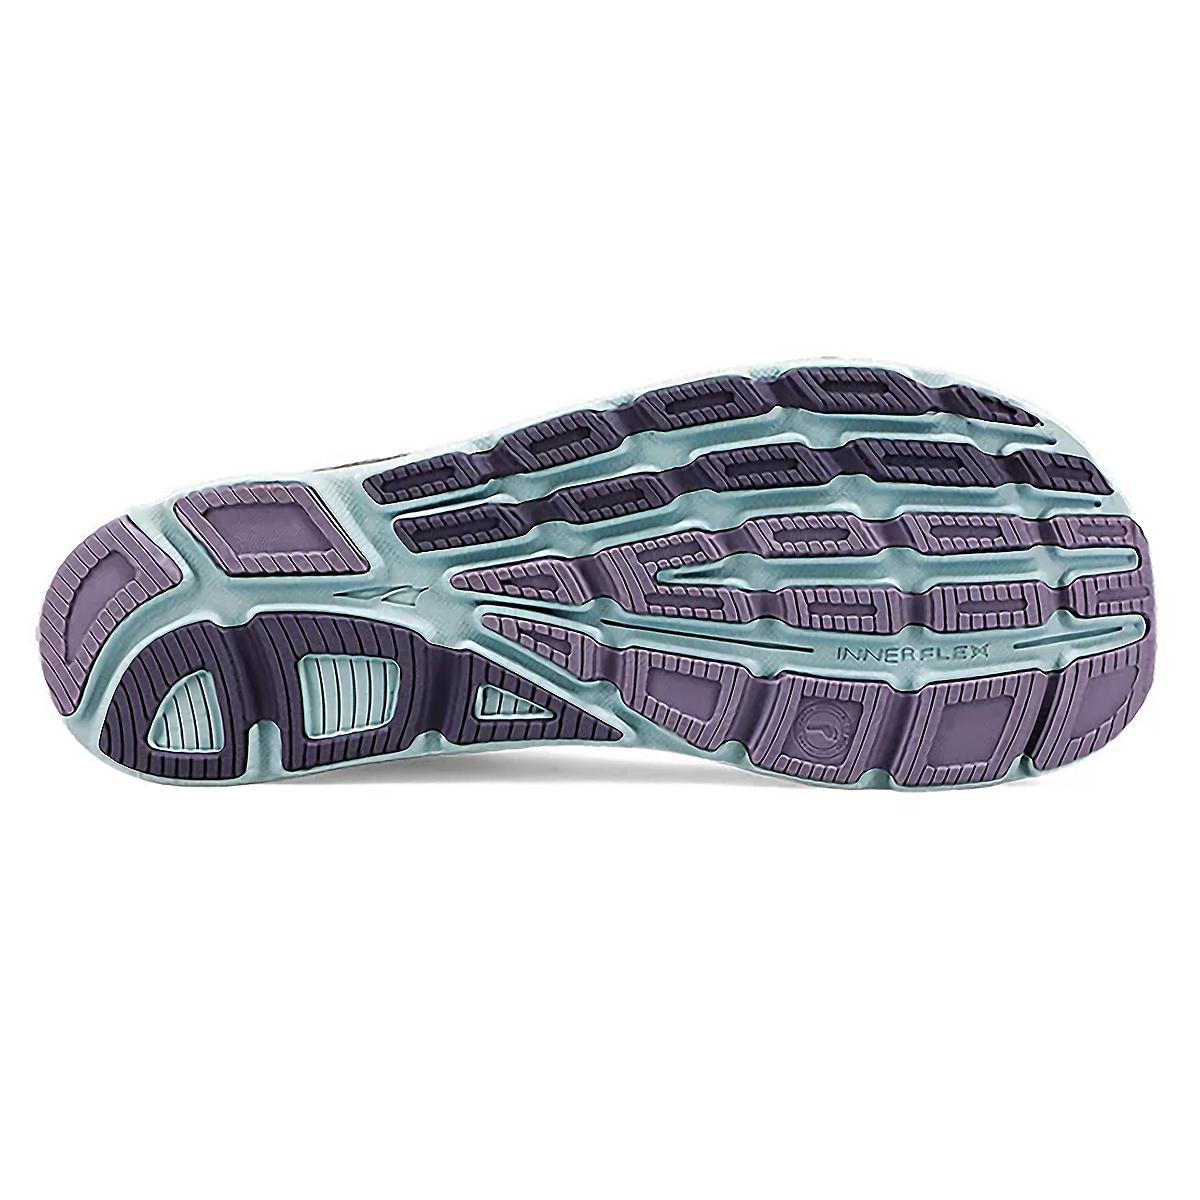 Women's Altra Torin 4.5 Plush Running Shoe - Color: Dark Gray - Size: 5.5 - Width: Regular, Dark Gray, large, image 3